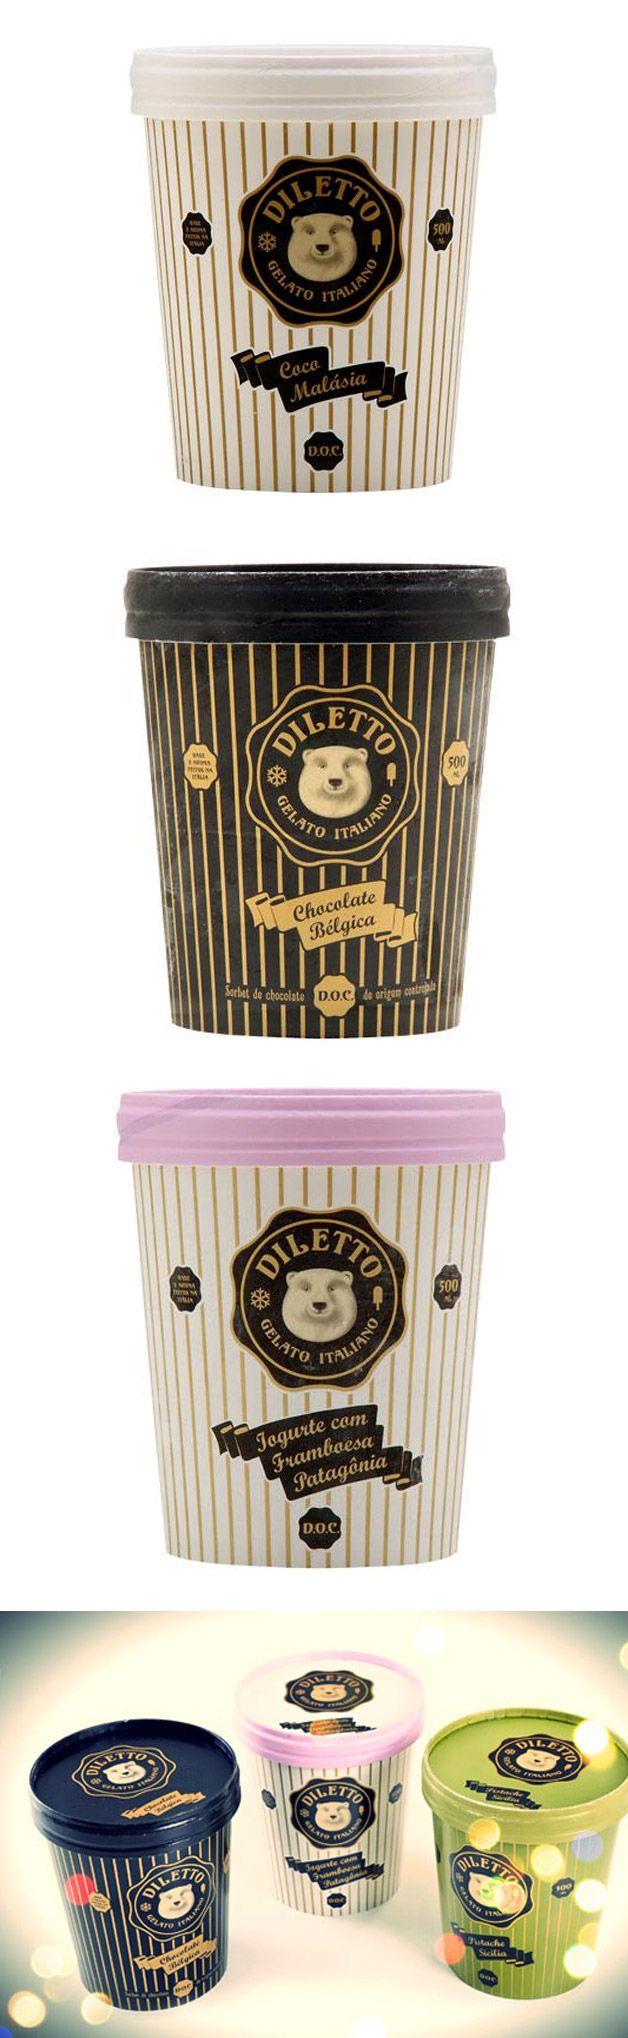 Package made for Diletto - a Brazillian premium Ice Cream Brand